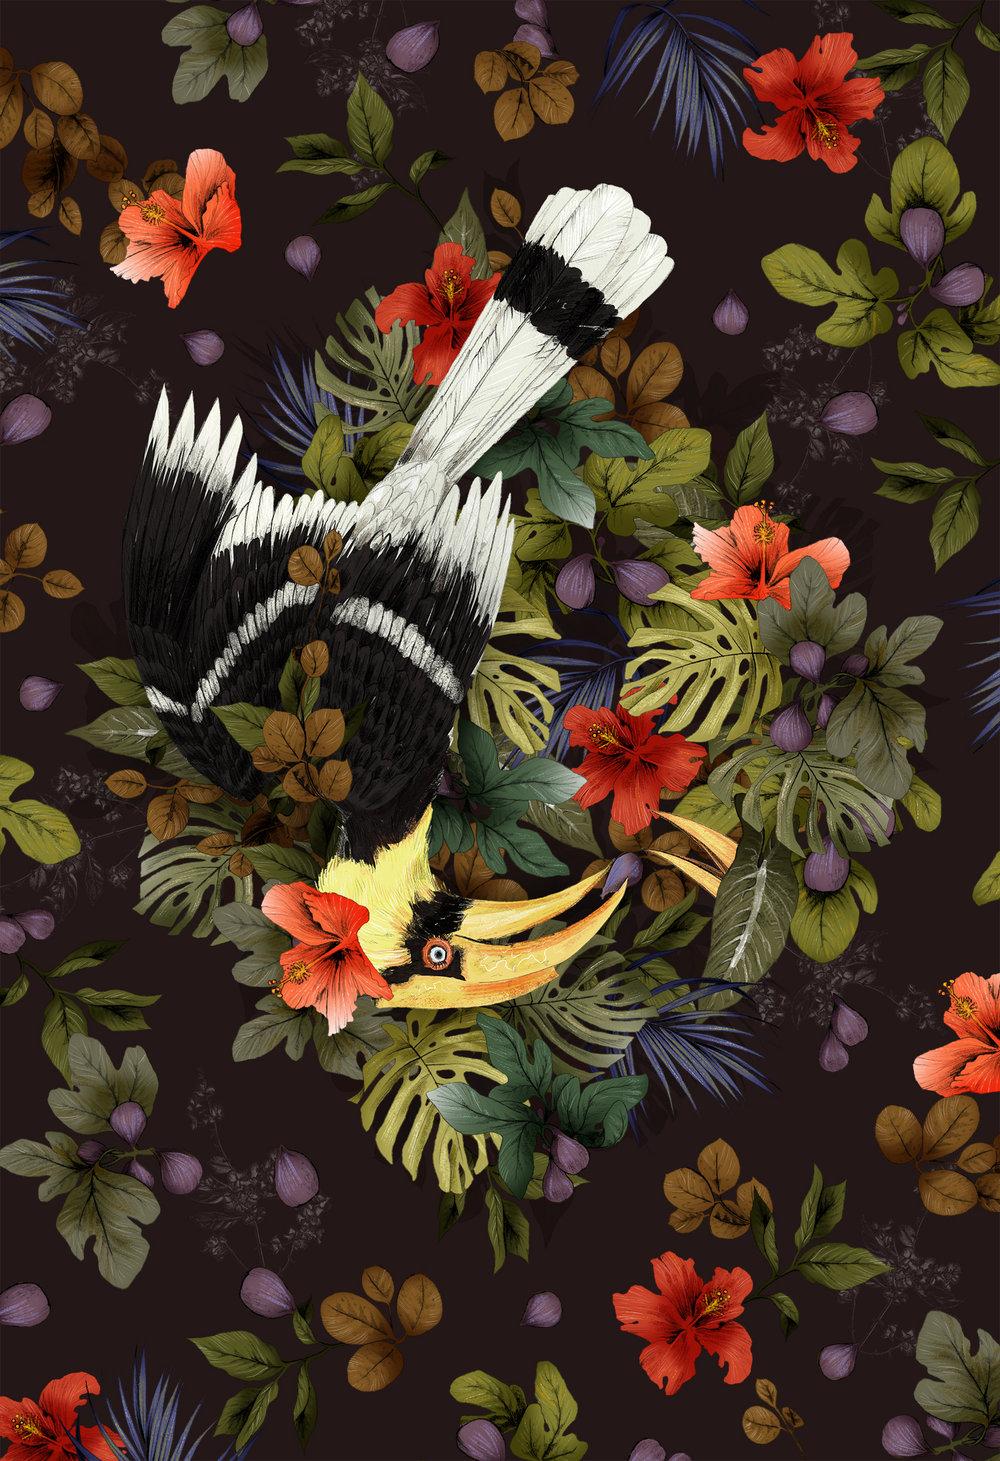 LASC_Camouflage_Hornbills_FinalArtwork.jpg